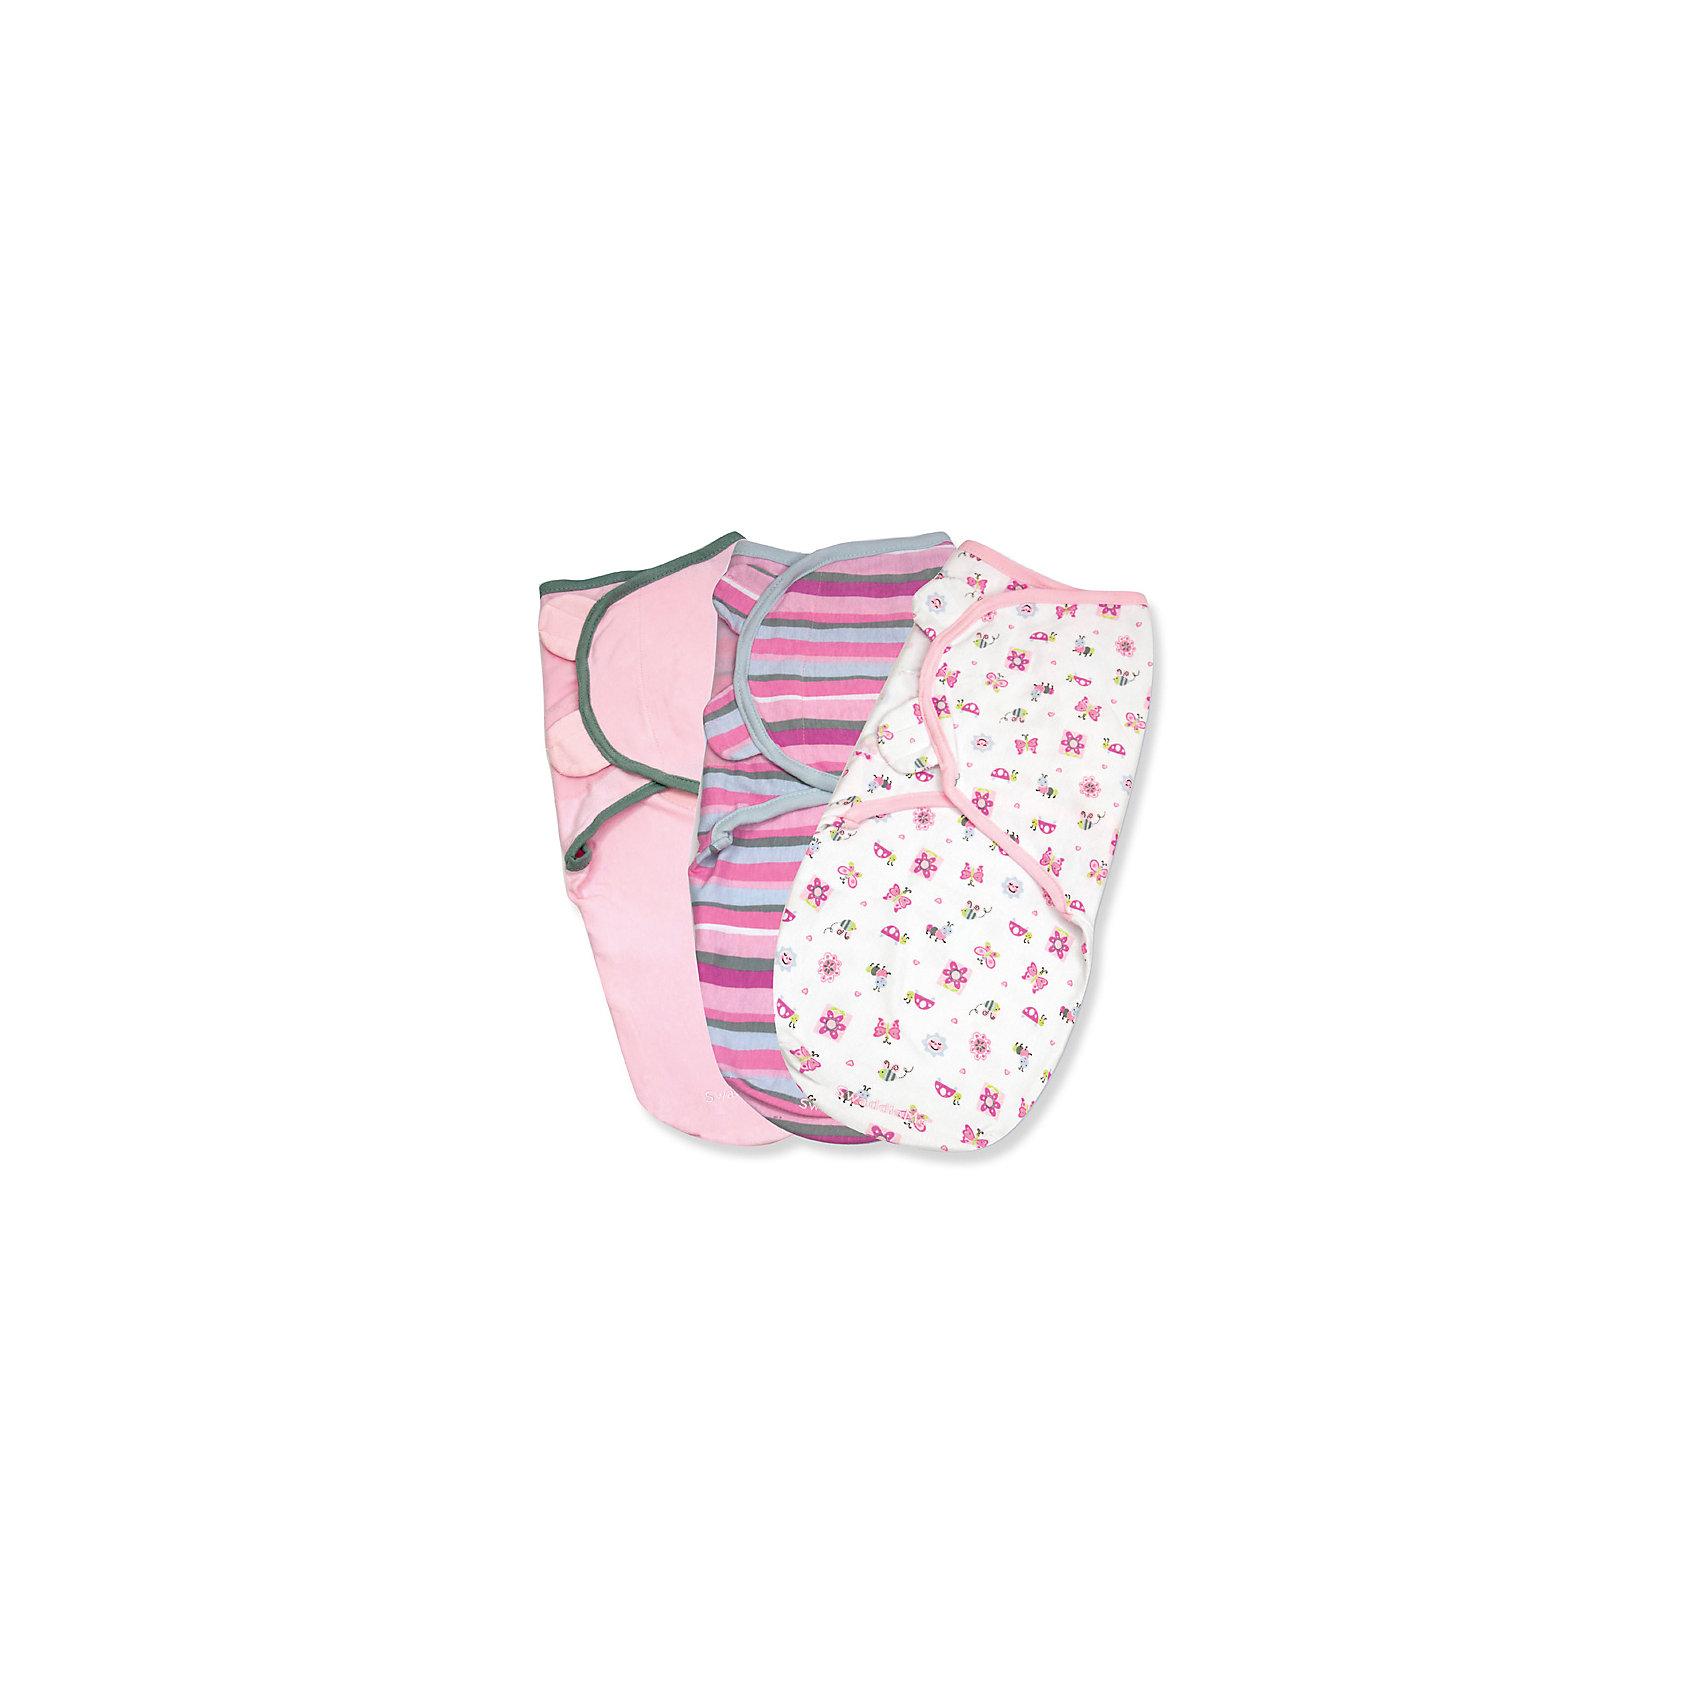 Конверт для пеленания на липучке, SWADDLEME®, р-р S/M, 3 шт., розовые жучки